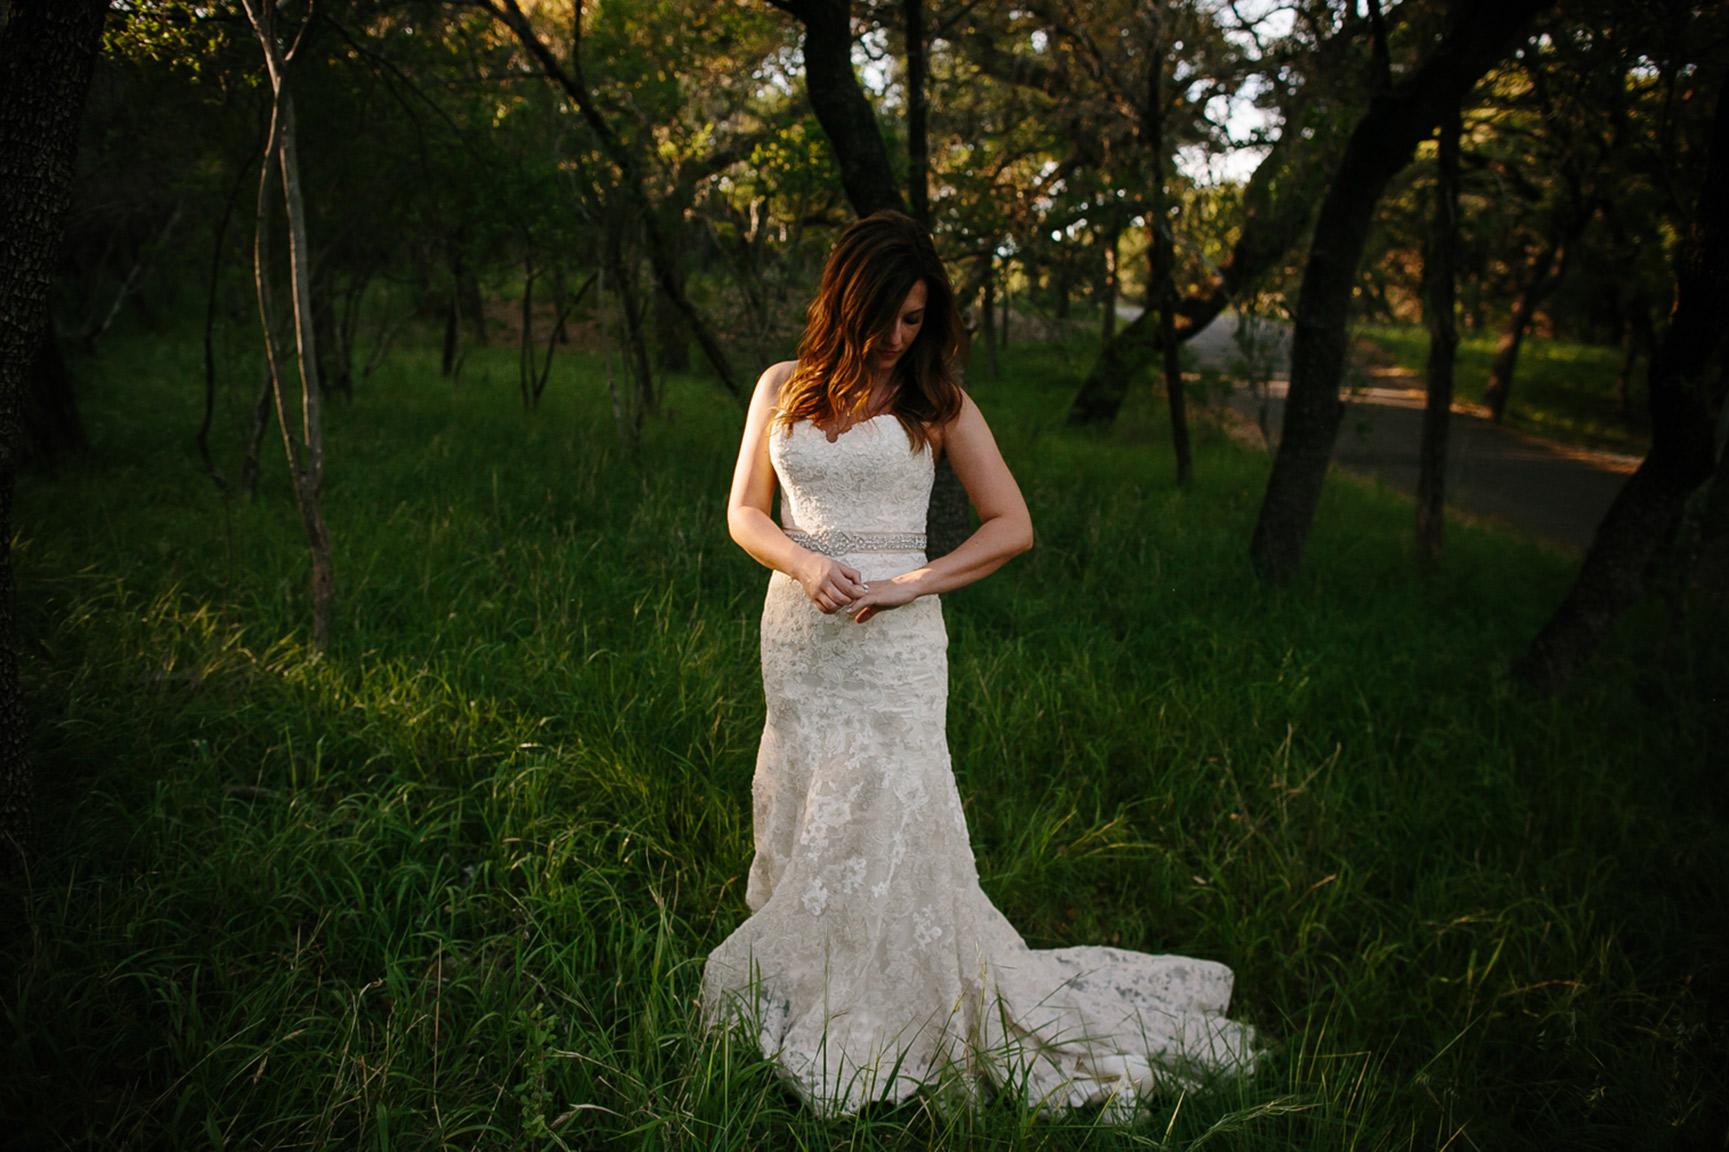 Austin_BRIDAL_WeddingPhotographer004.jpg